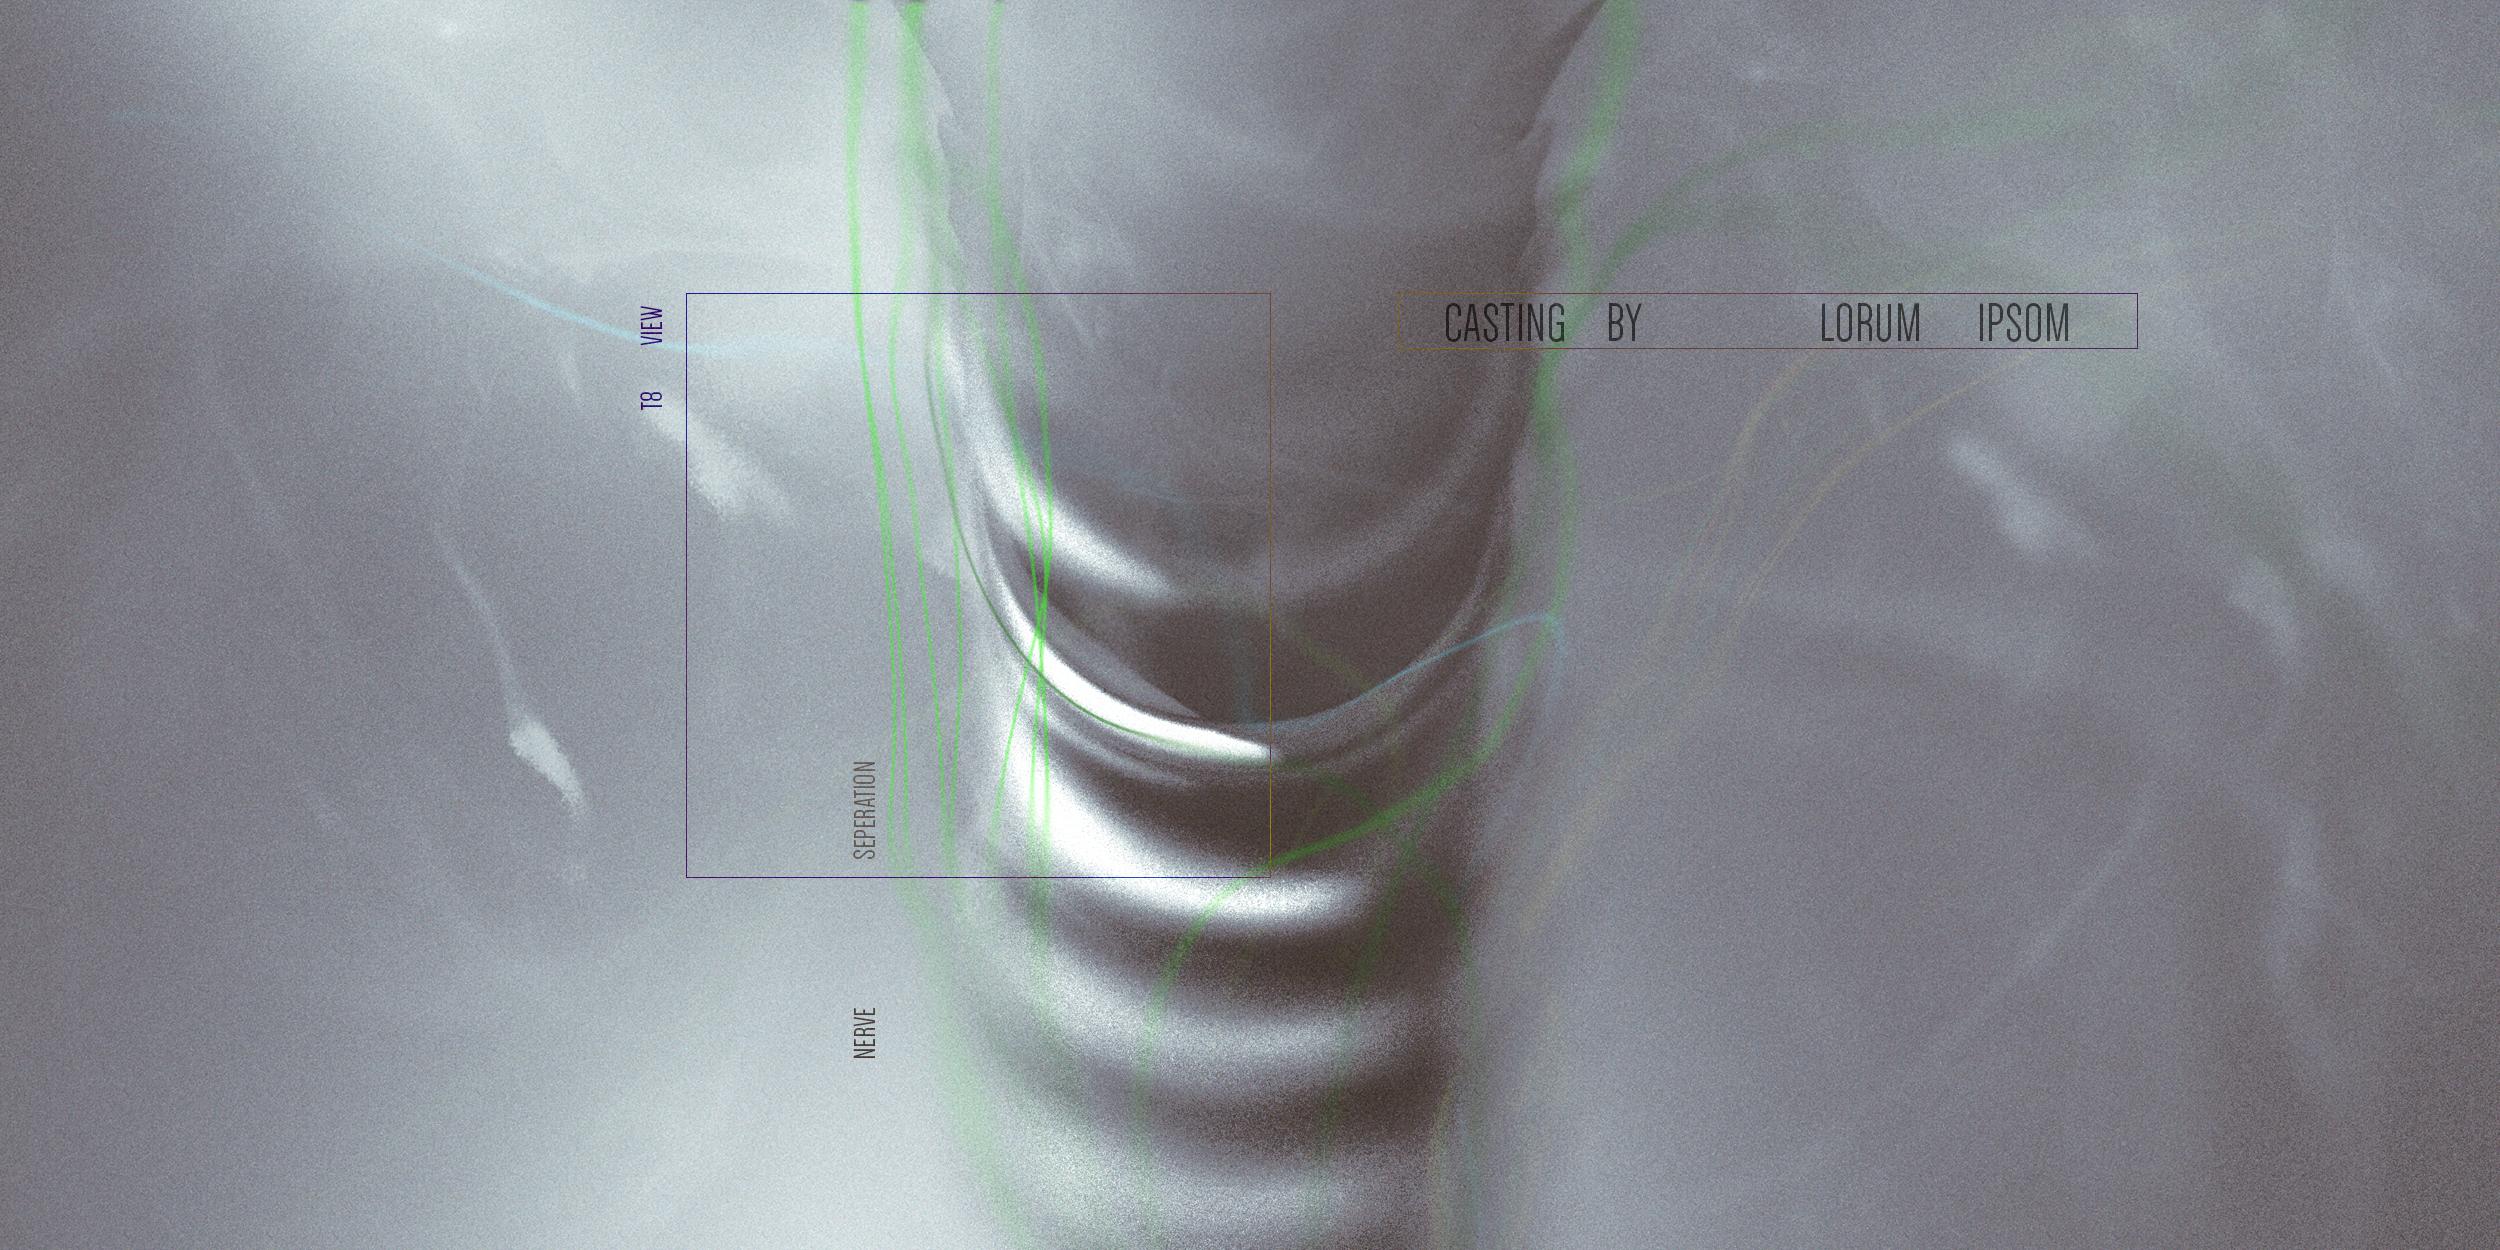 02-A1OU-SKELETAL-DRAWING-01-2-4.jpg